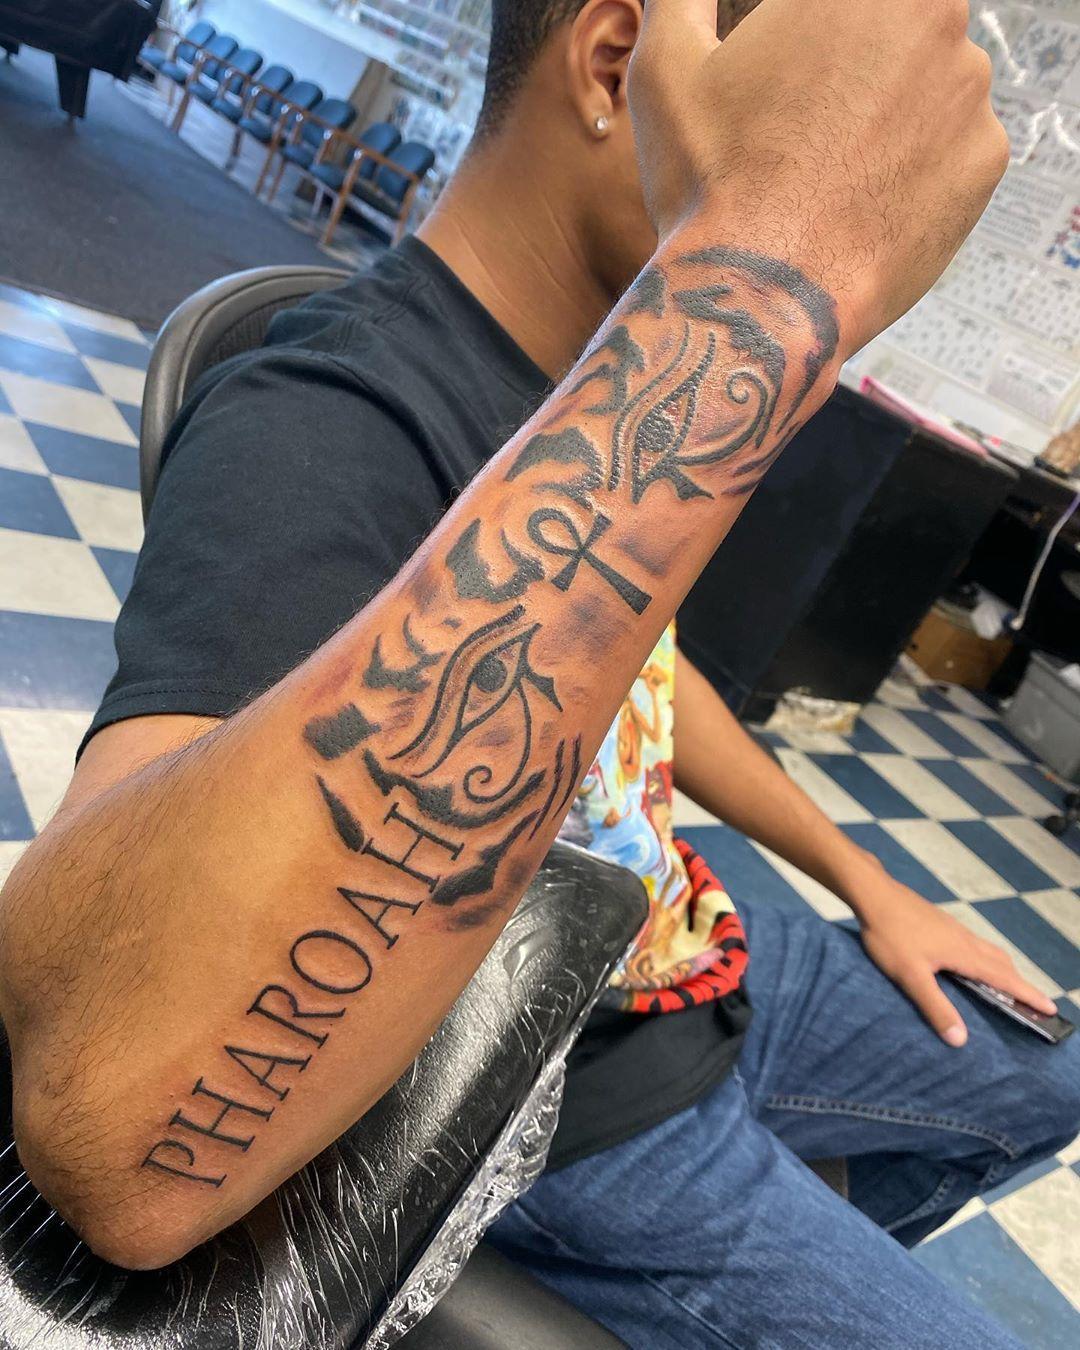 101 Half Sleeve Tattoo Ideas You Need To See!